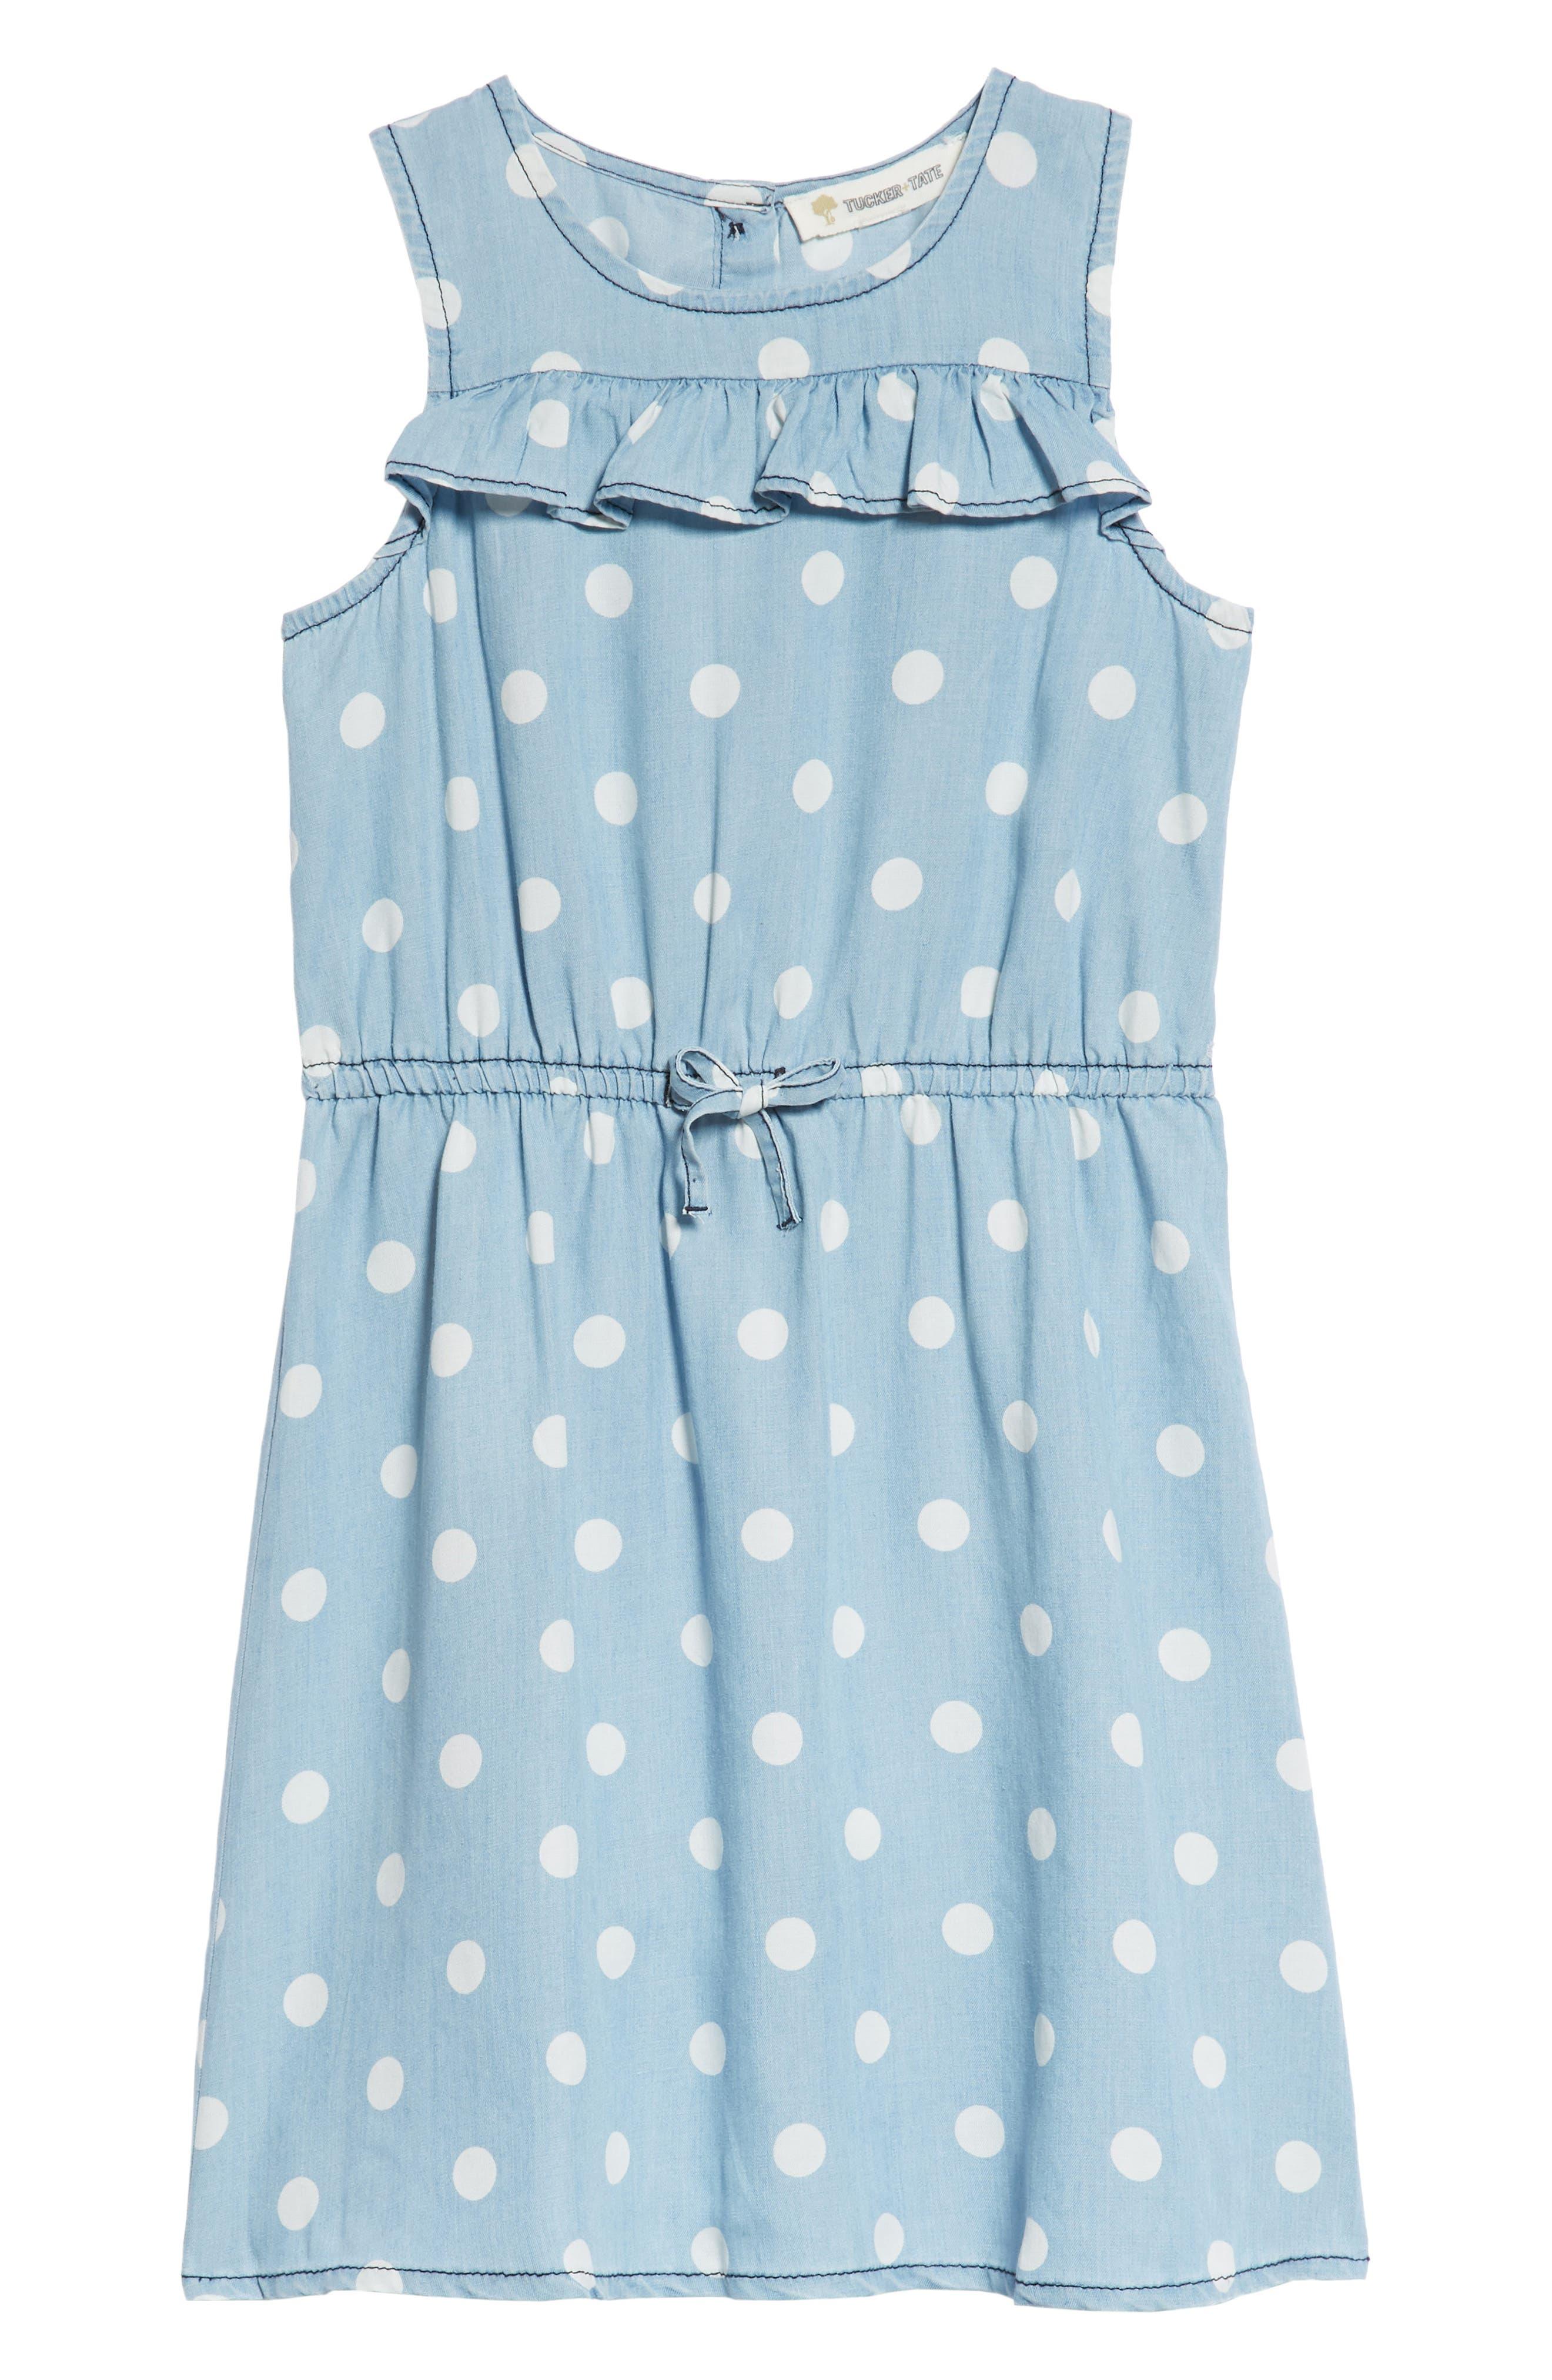 Polka Dot Ruffle Dress,                         Main,                         color, Blue Wash Dot Print